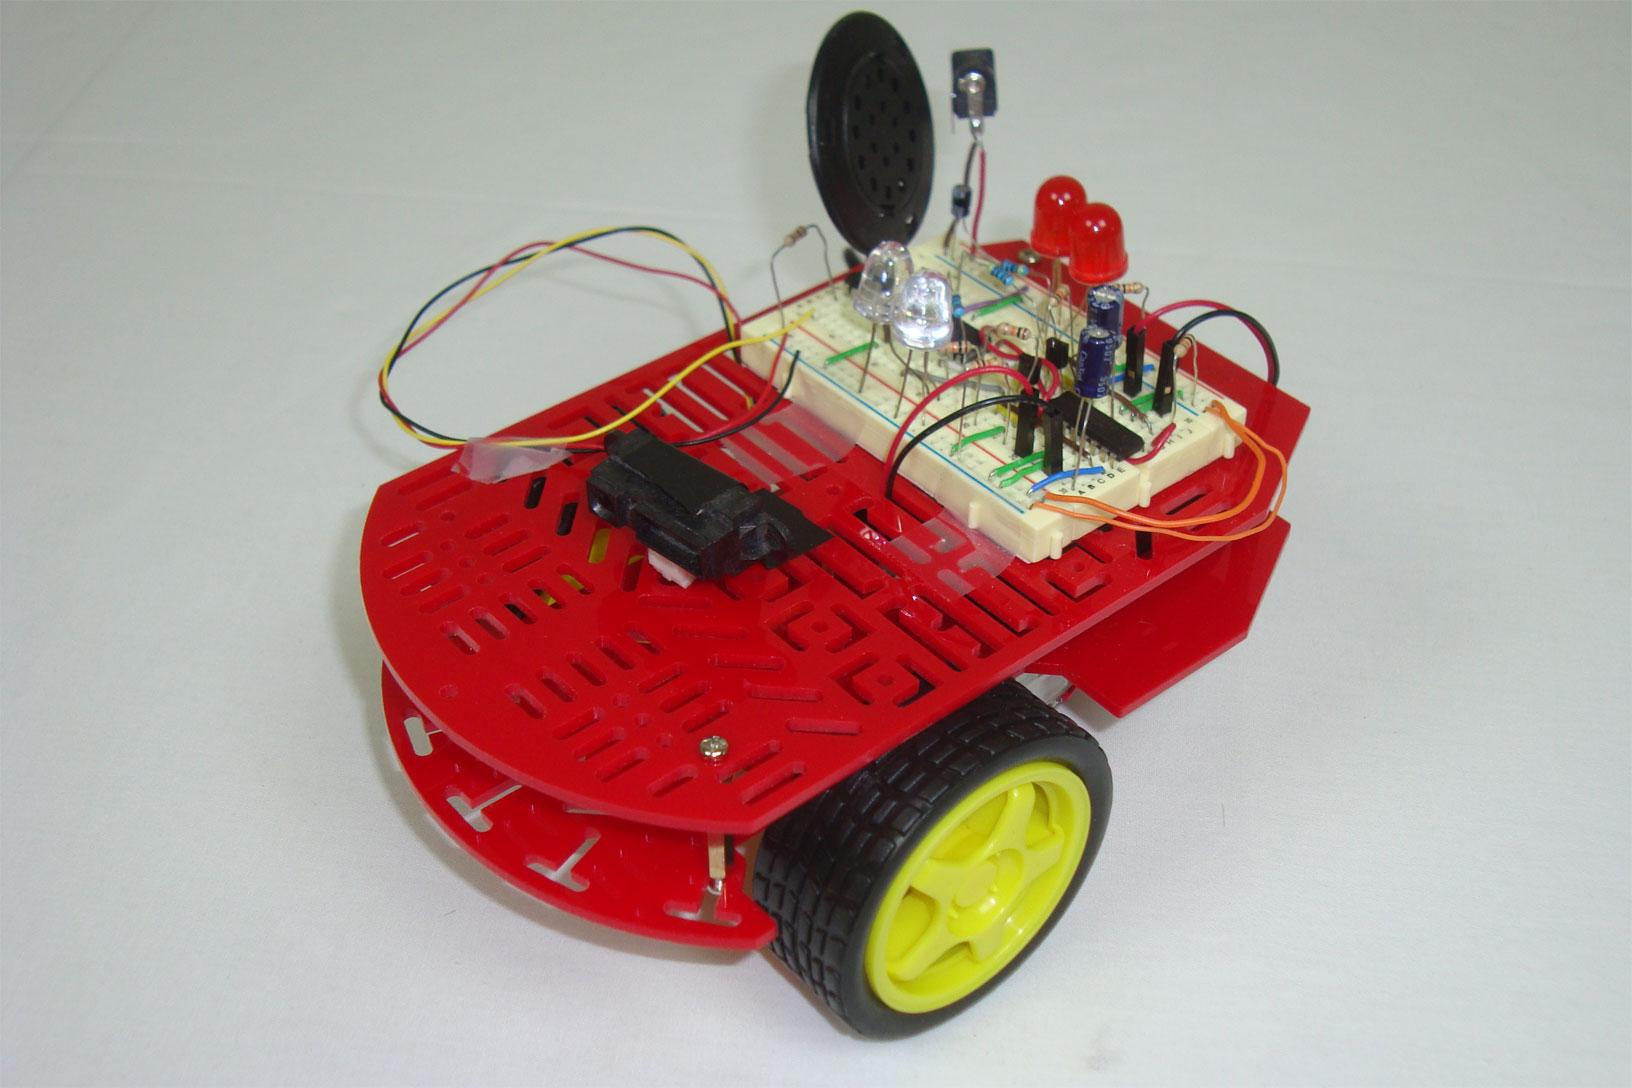 Building A Robot Proximity Sensor Introduction Pyroelectro News How To Build An Infrared Ir Distance Circuit The Setup